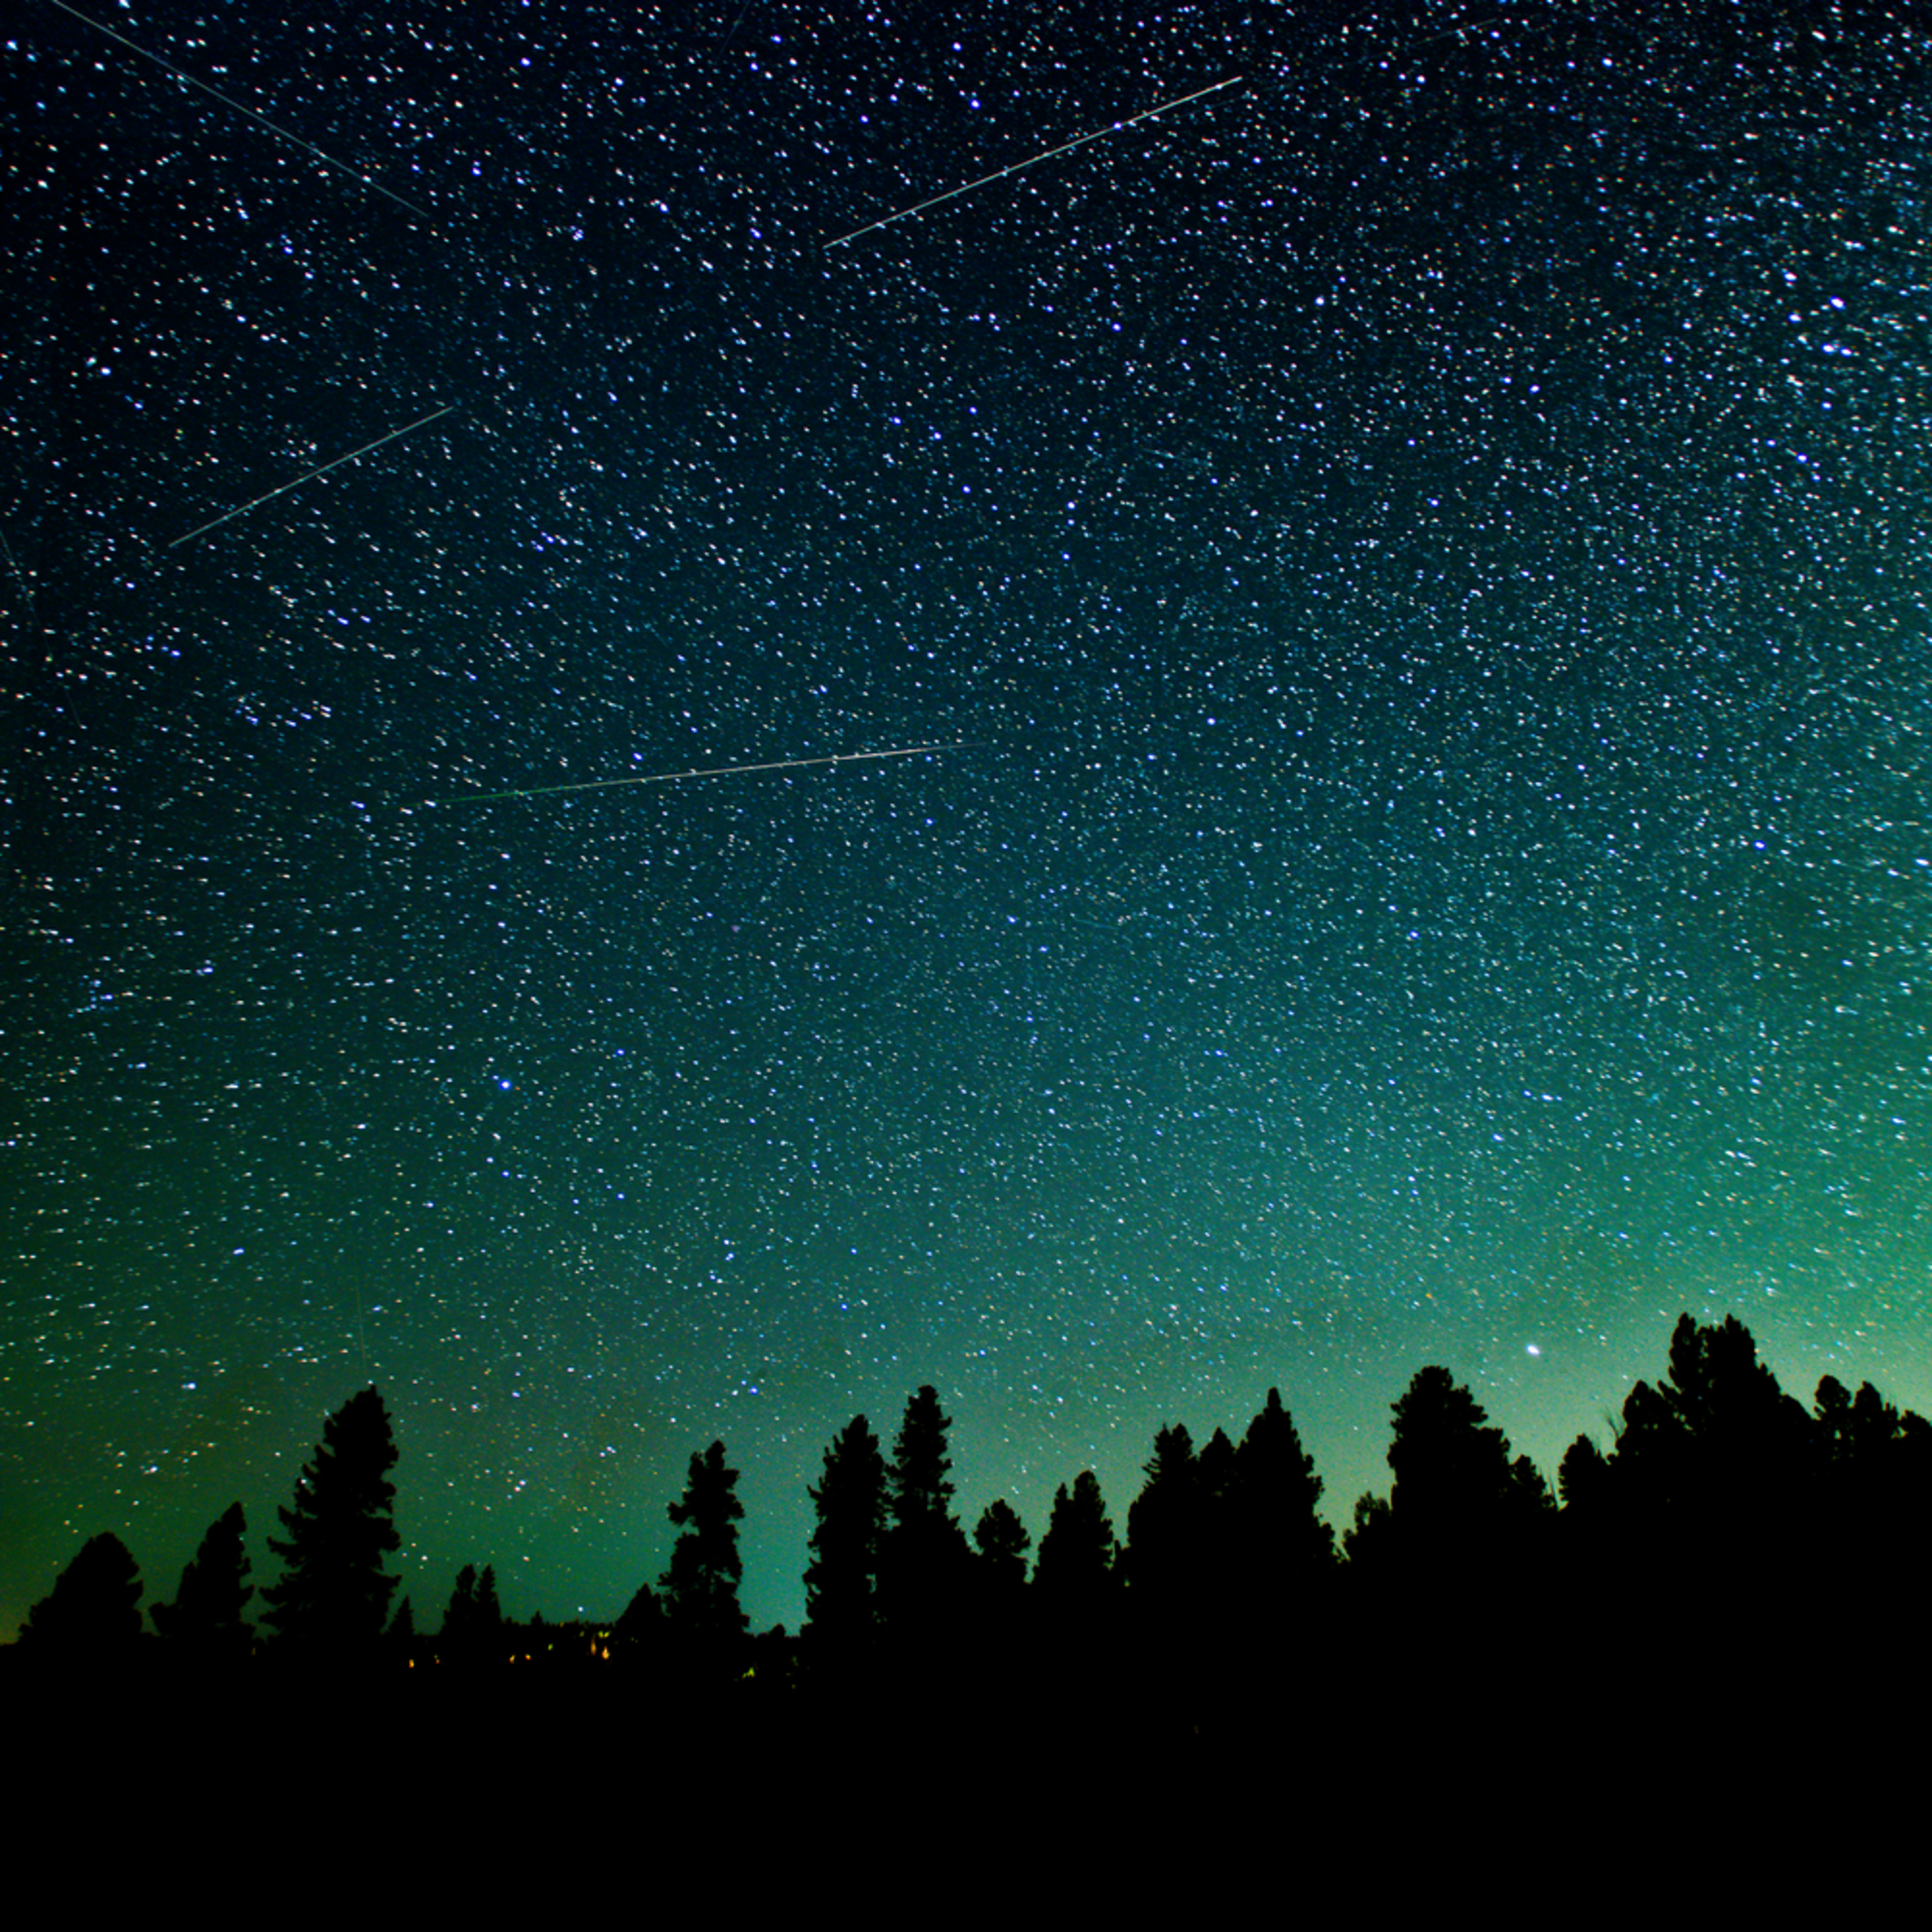 Ut dcv meteors stars dngtest 2 cd j3cceh